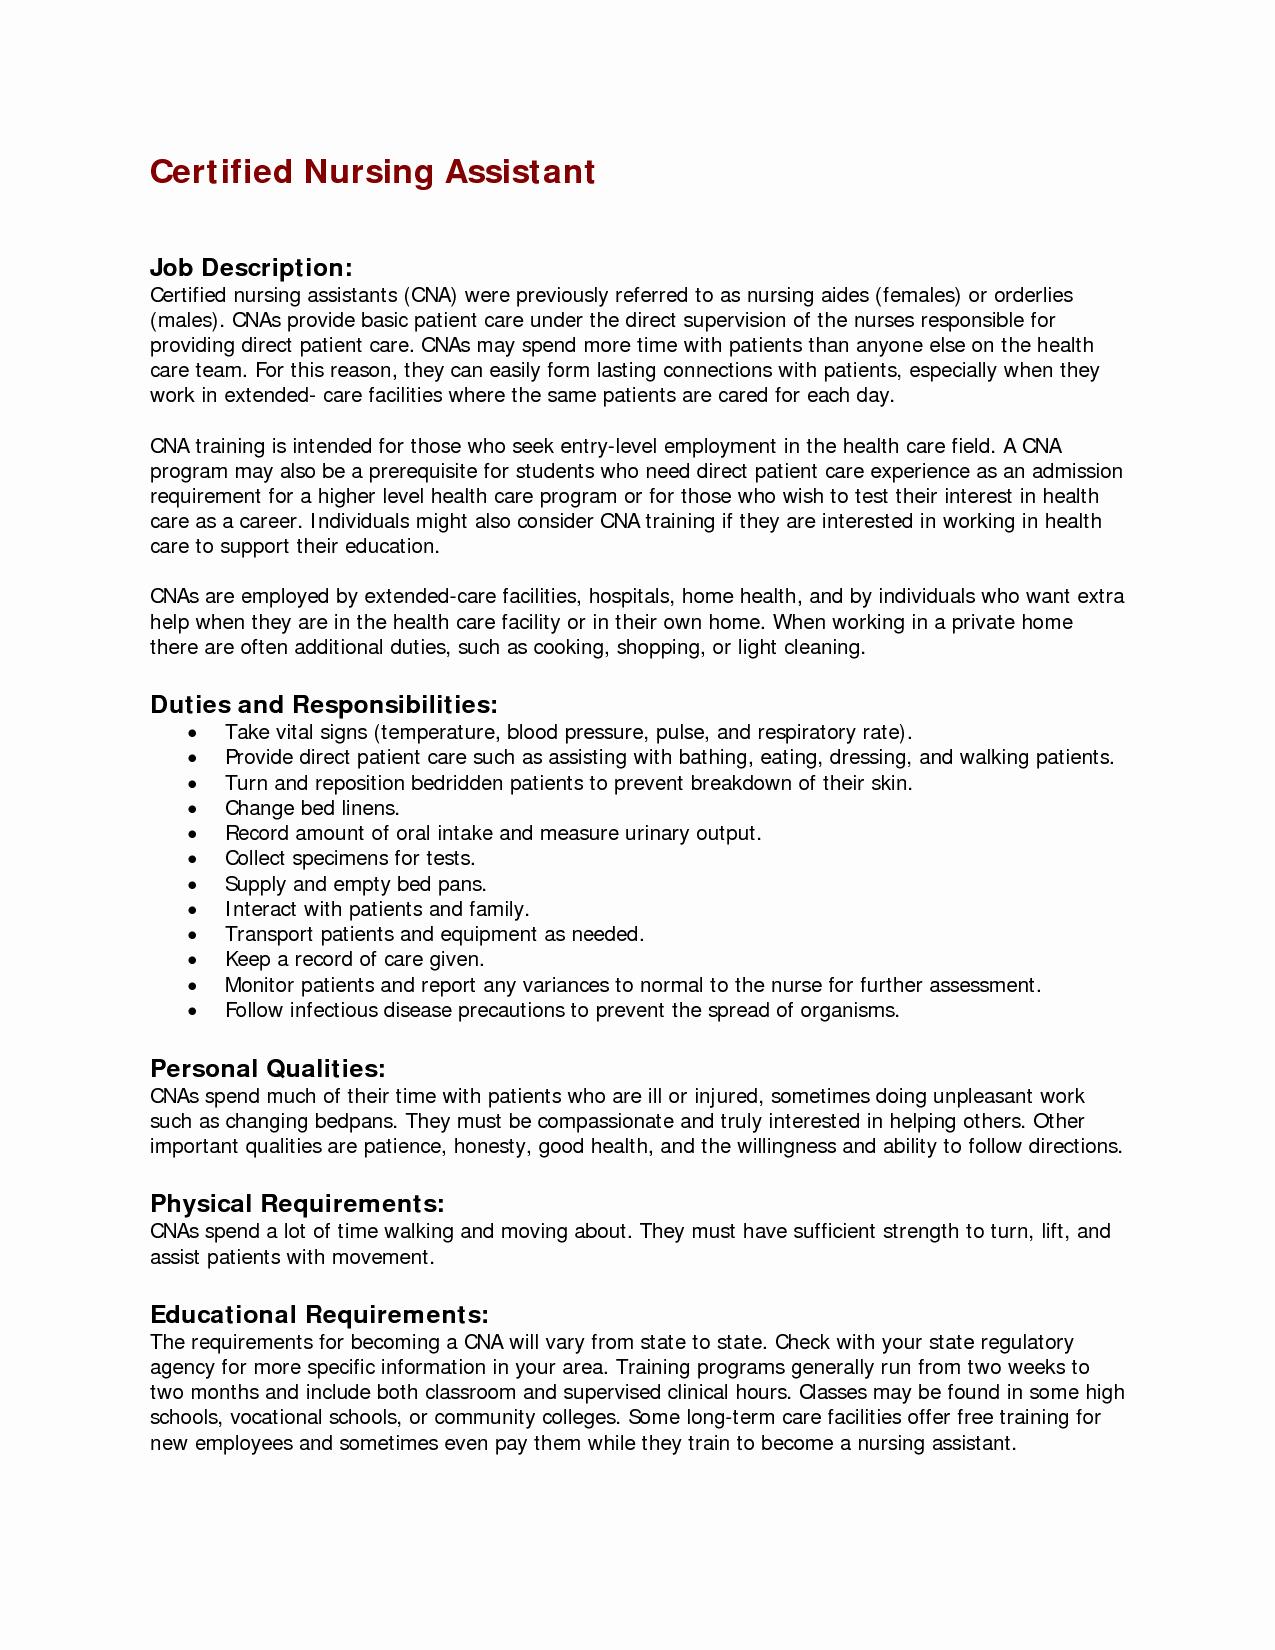 Nursing assistant Job Description for Resume Resume Ideas